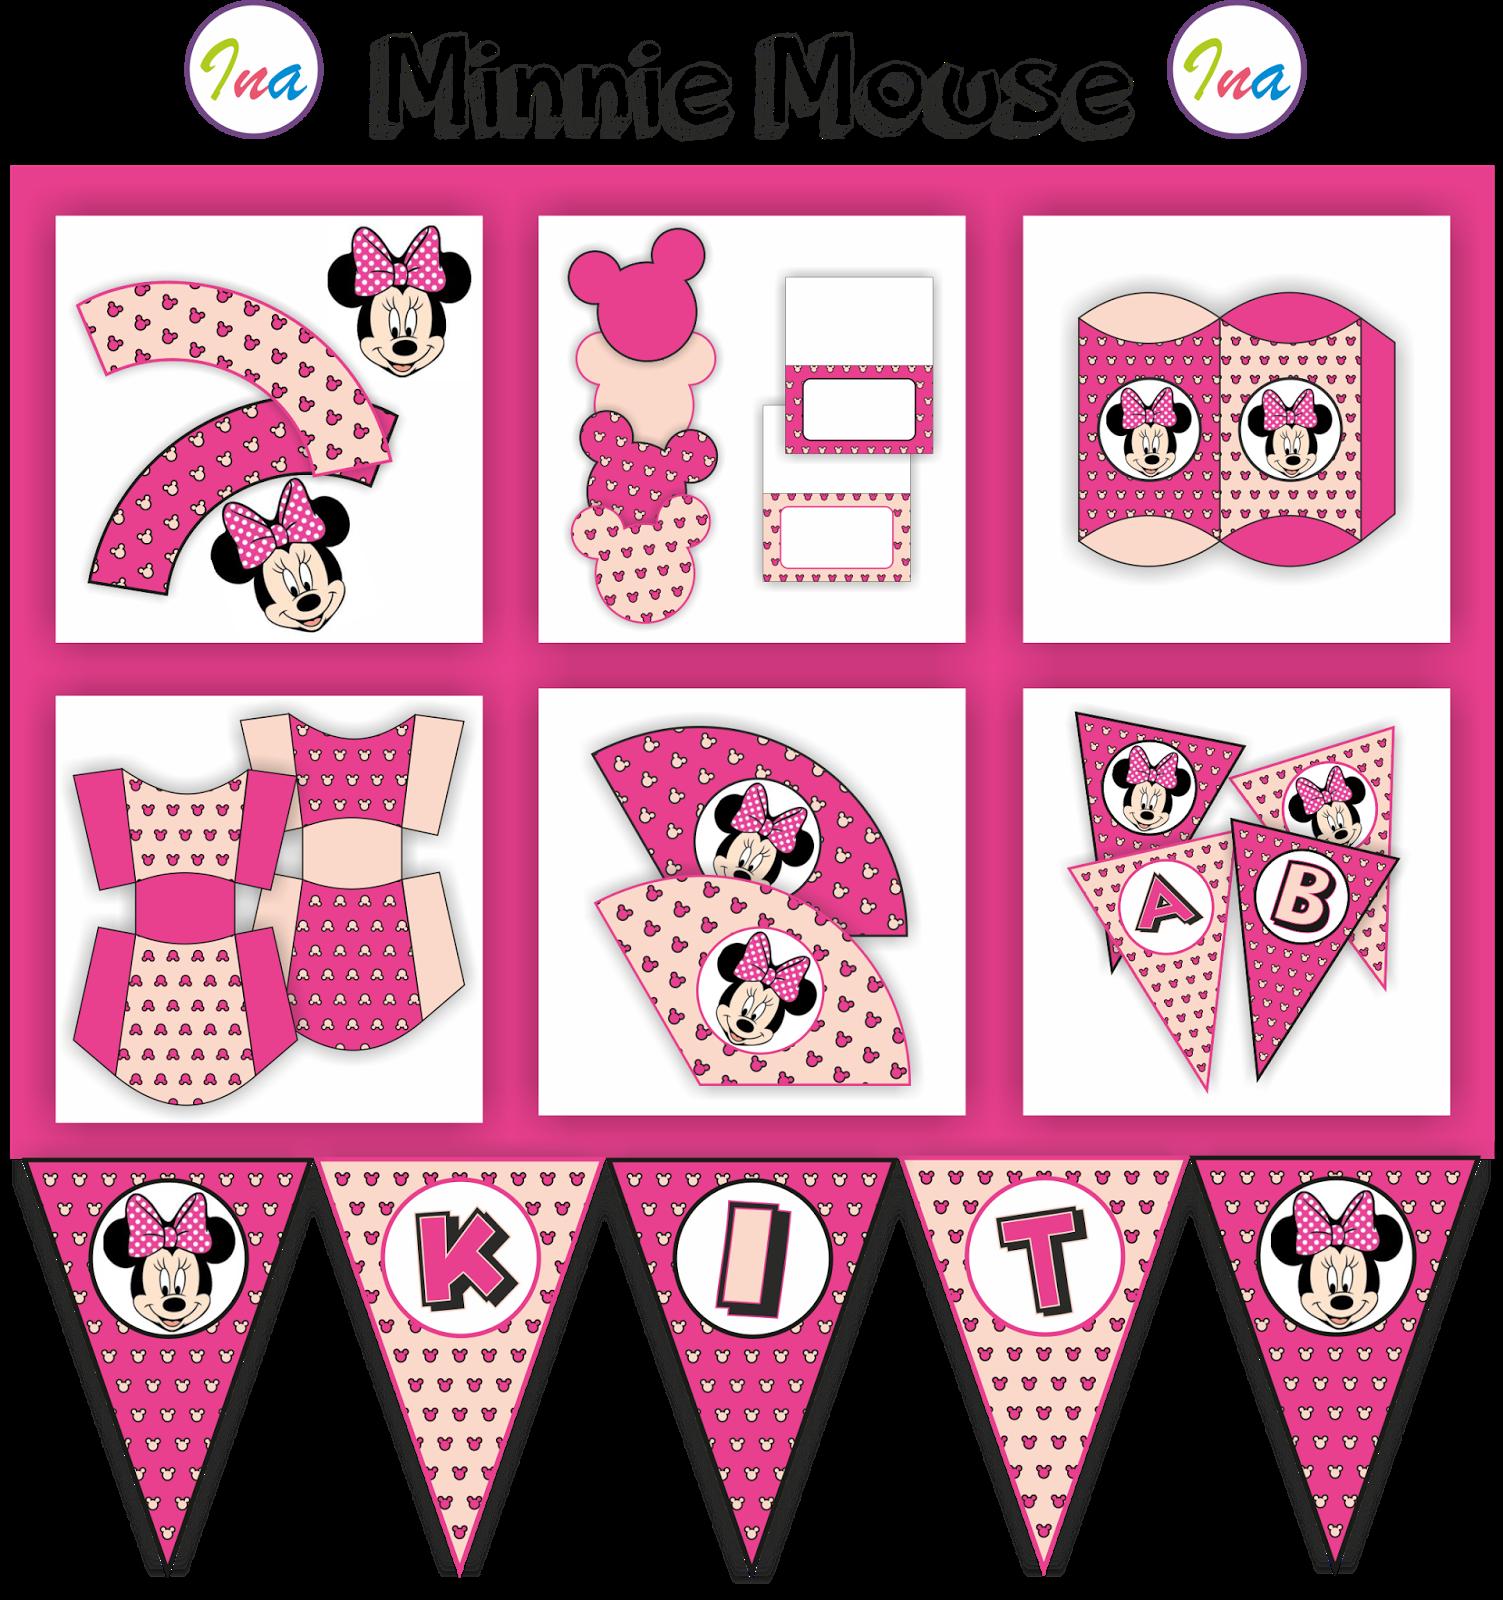 Fiesta Temática Mickey y Minnie Mouse | chuli | Pinterest | Minnie ...